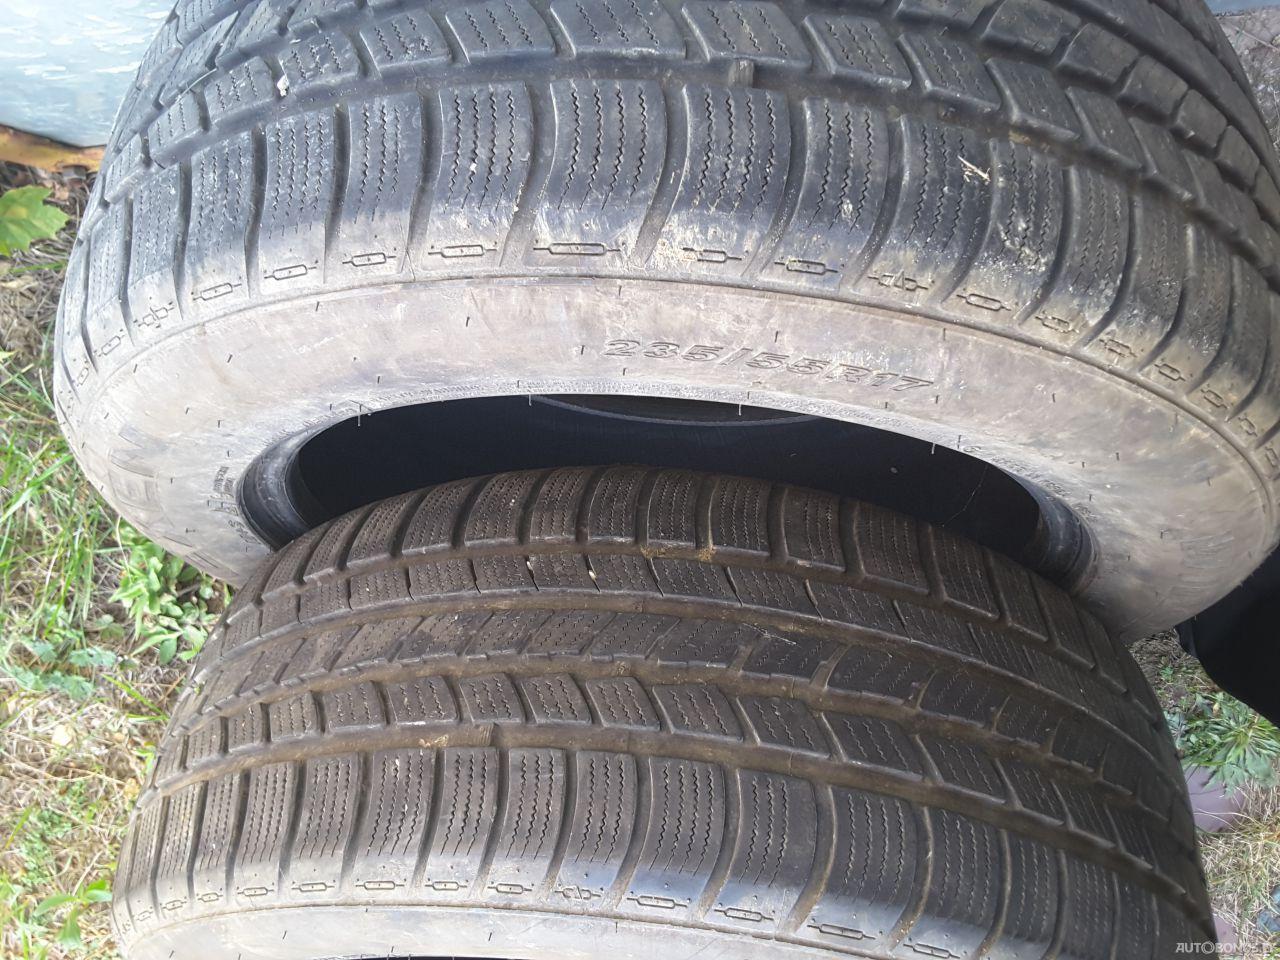 Nexen winter tyres